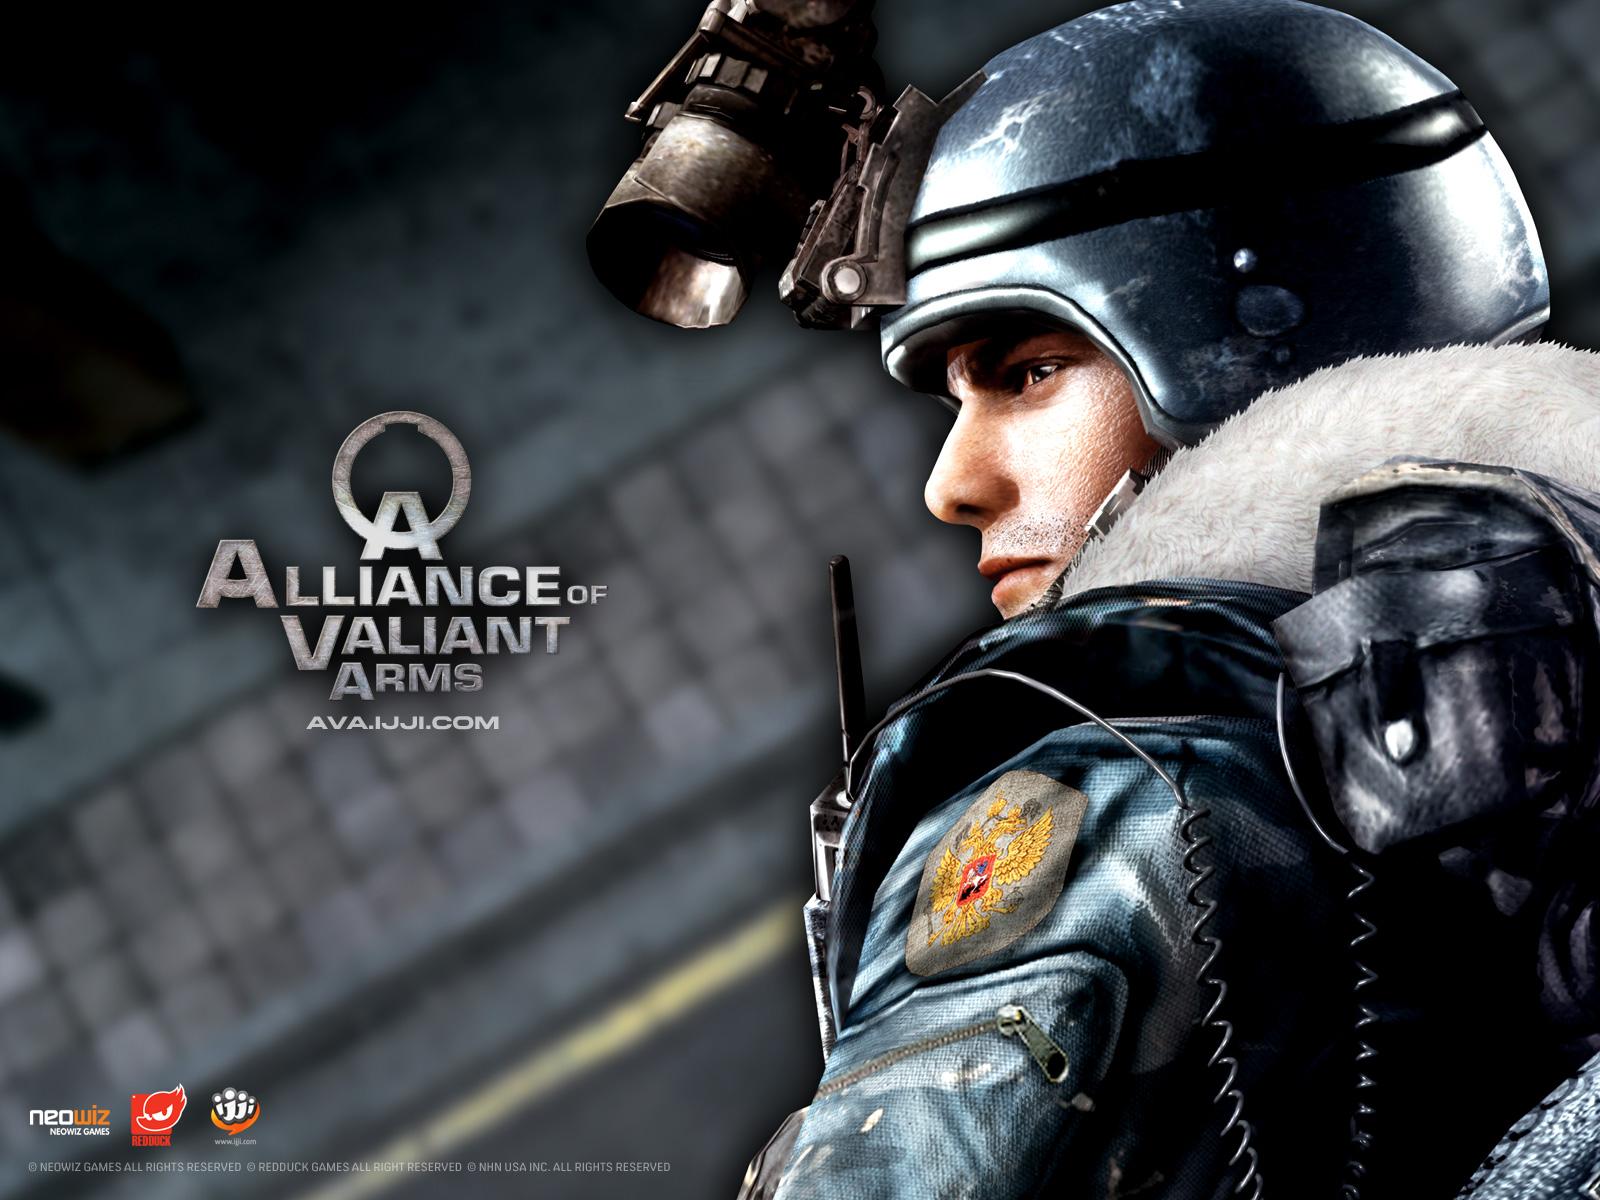 alliance of valiant arms wallpaper 2 AVA Oyun Hileleri Knife Booster 2x More knife range indir